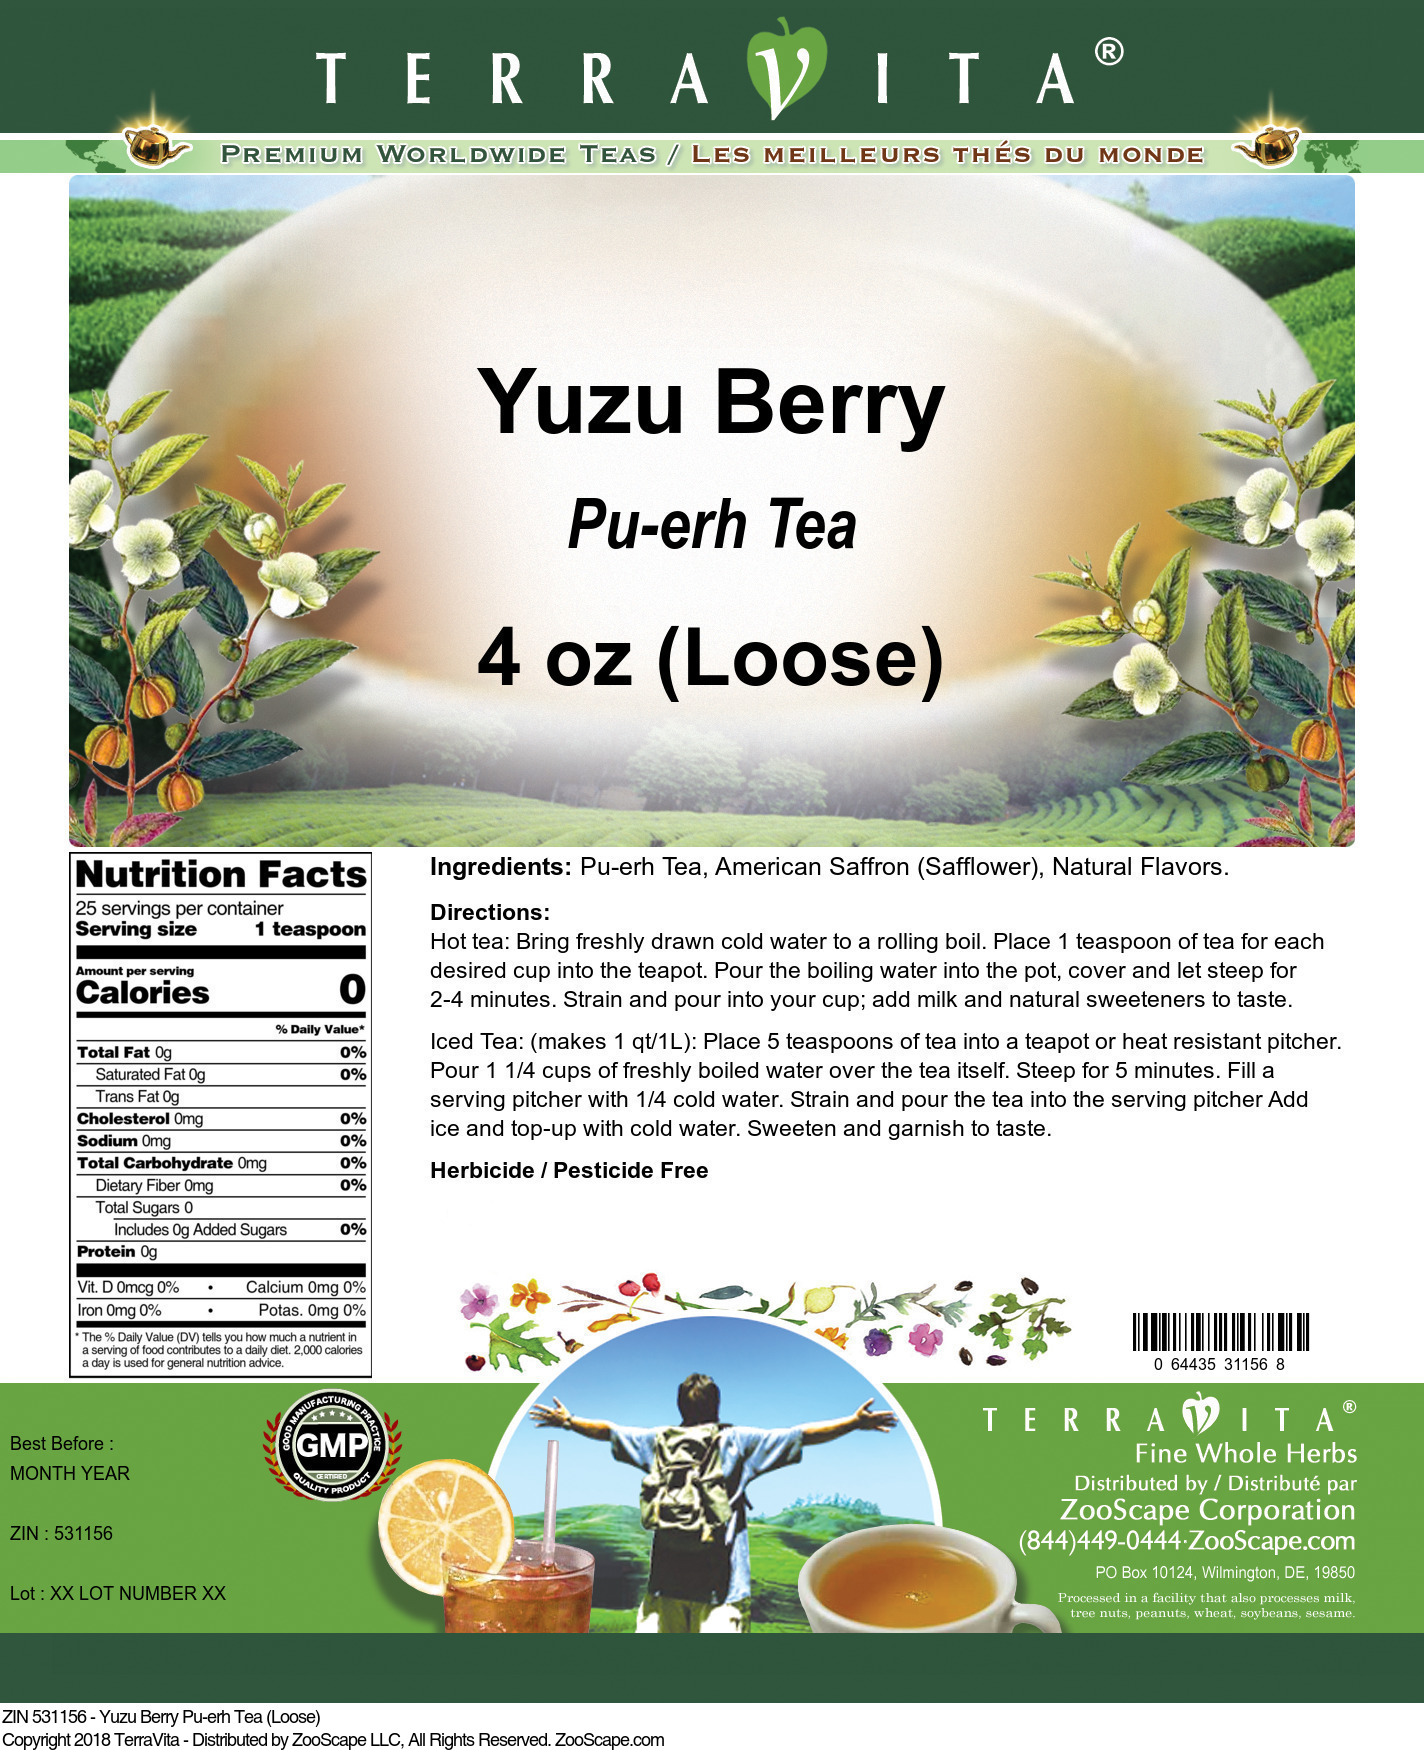 Yuzu Berry Pu-erh Tea (Loose)